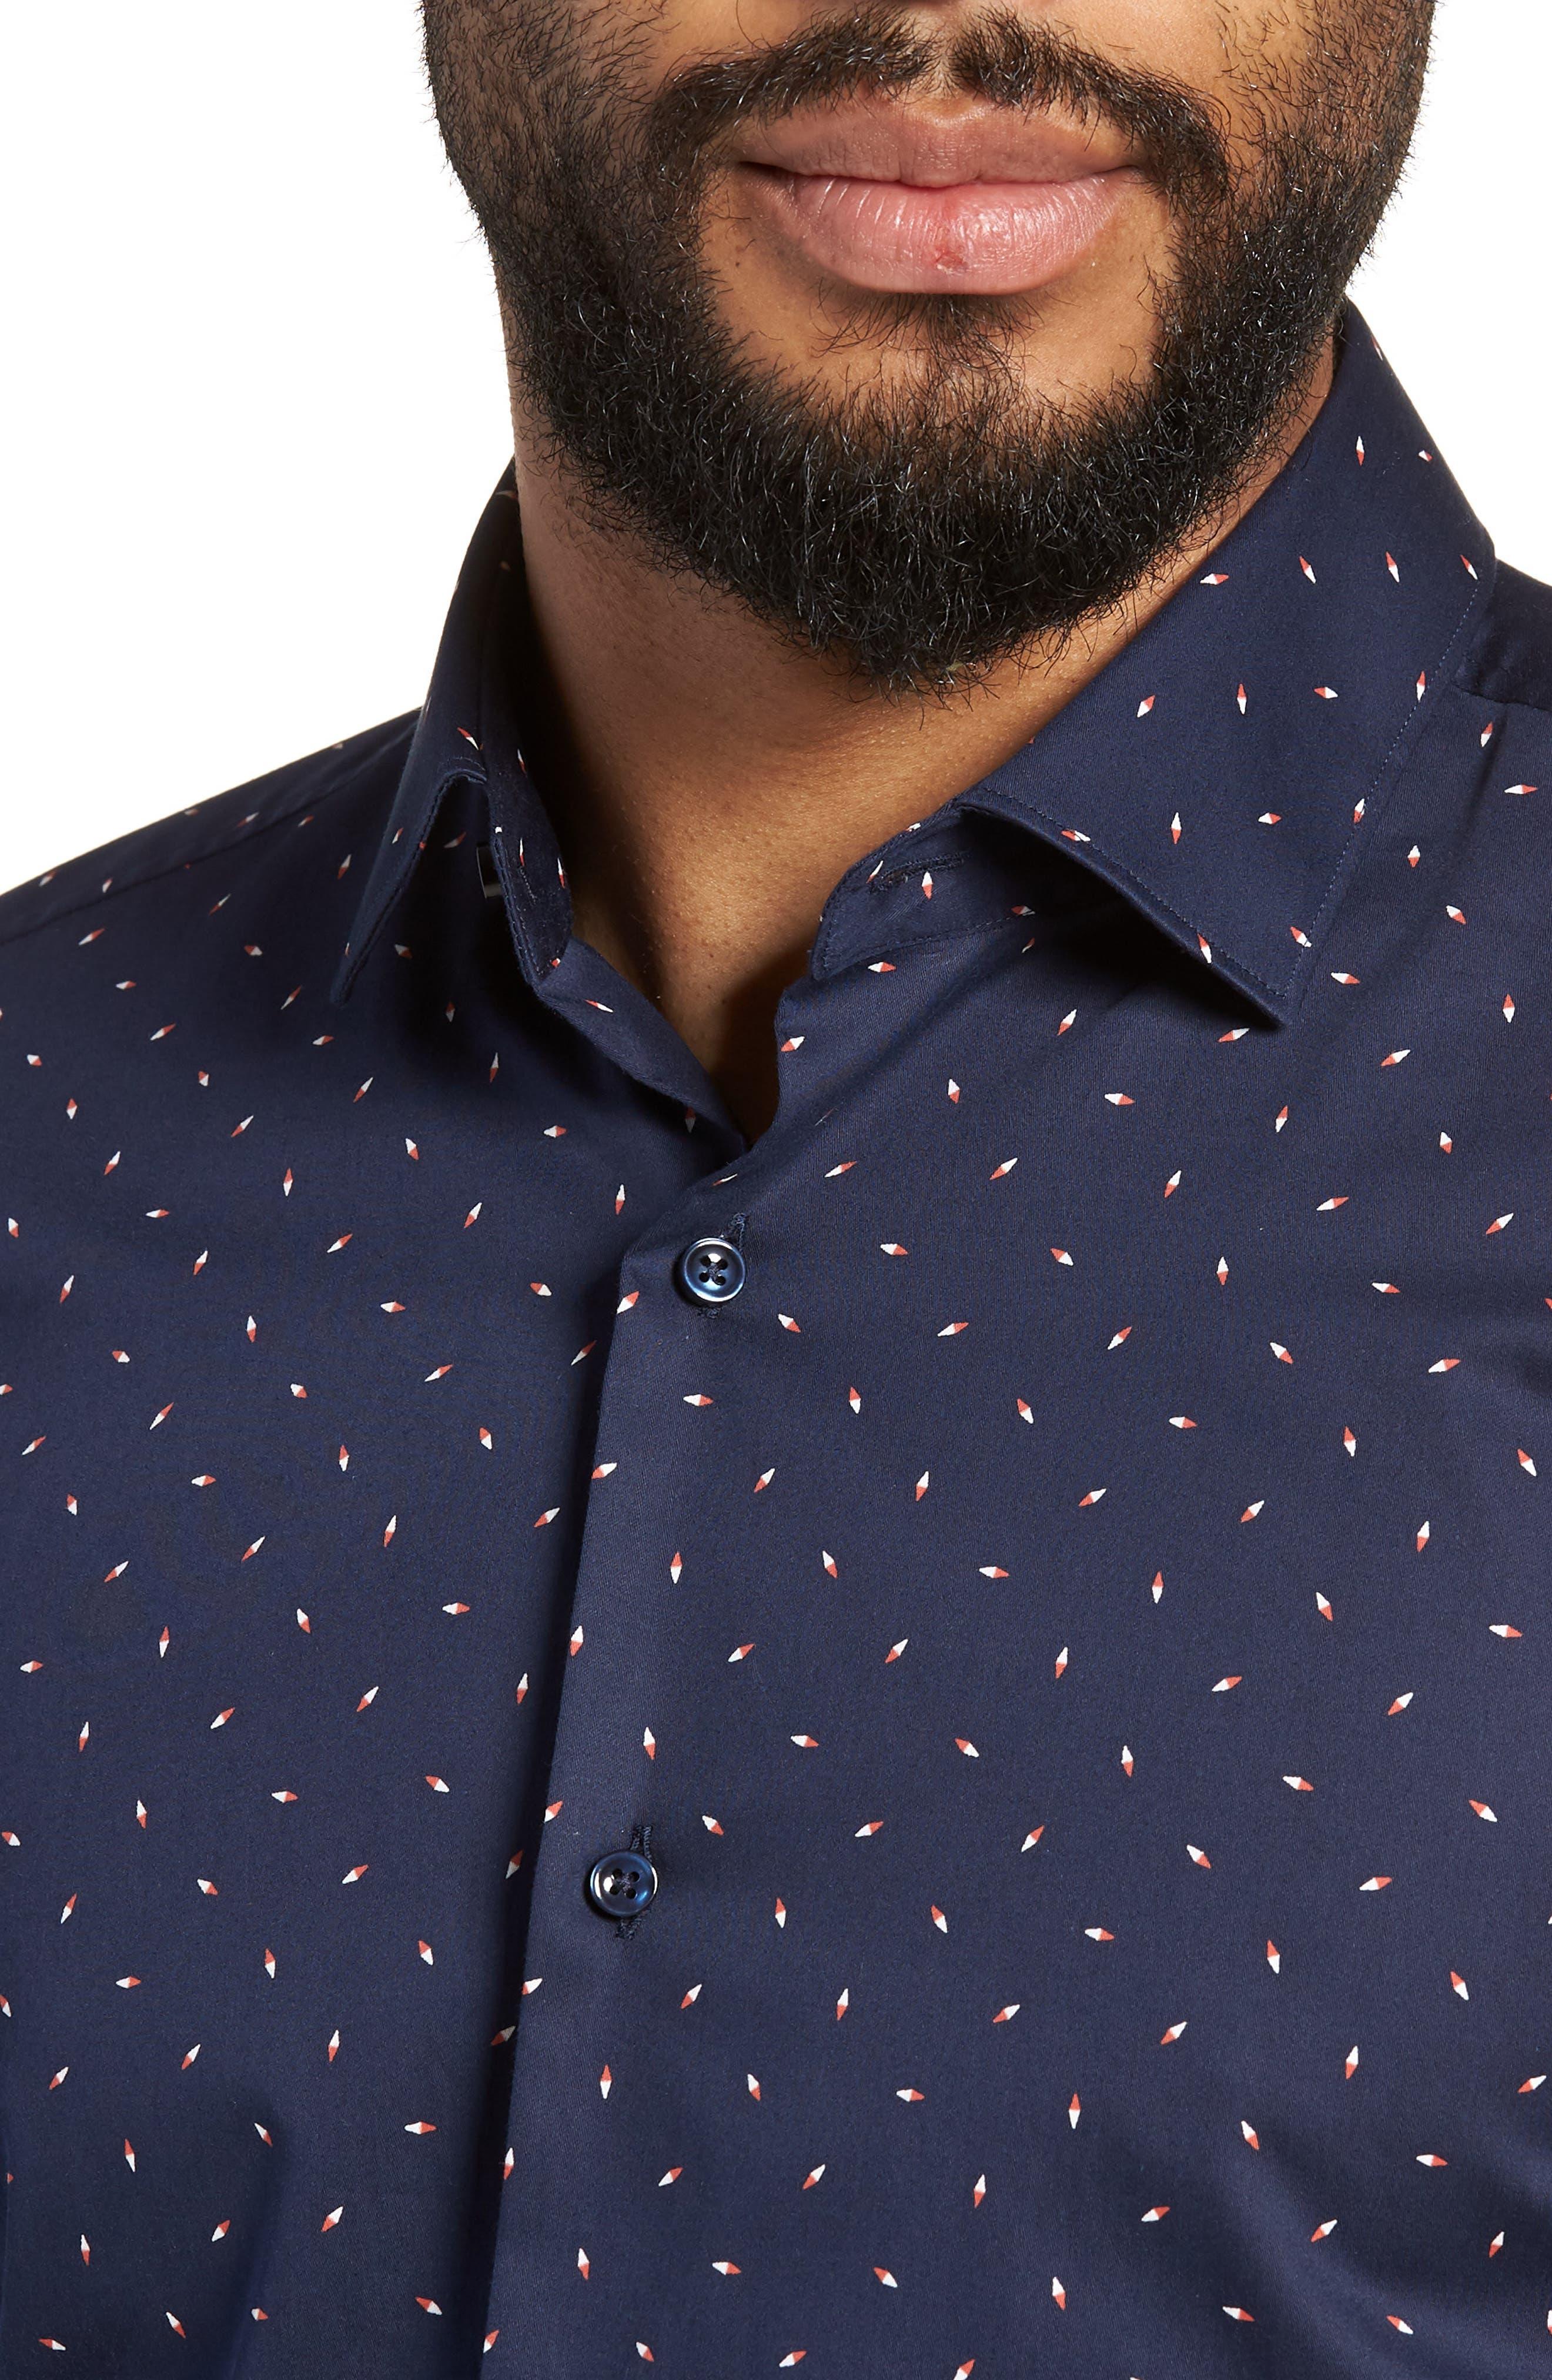 Ismo Slim Fit Print Dress Shirt,                             Alternate thumbnail 2, color,                             Navy